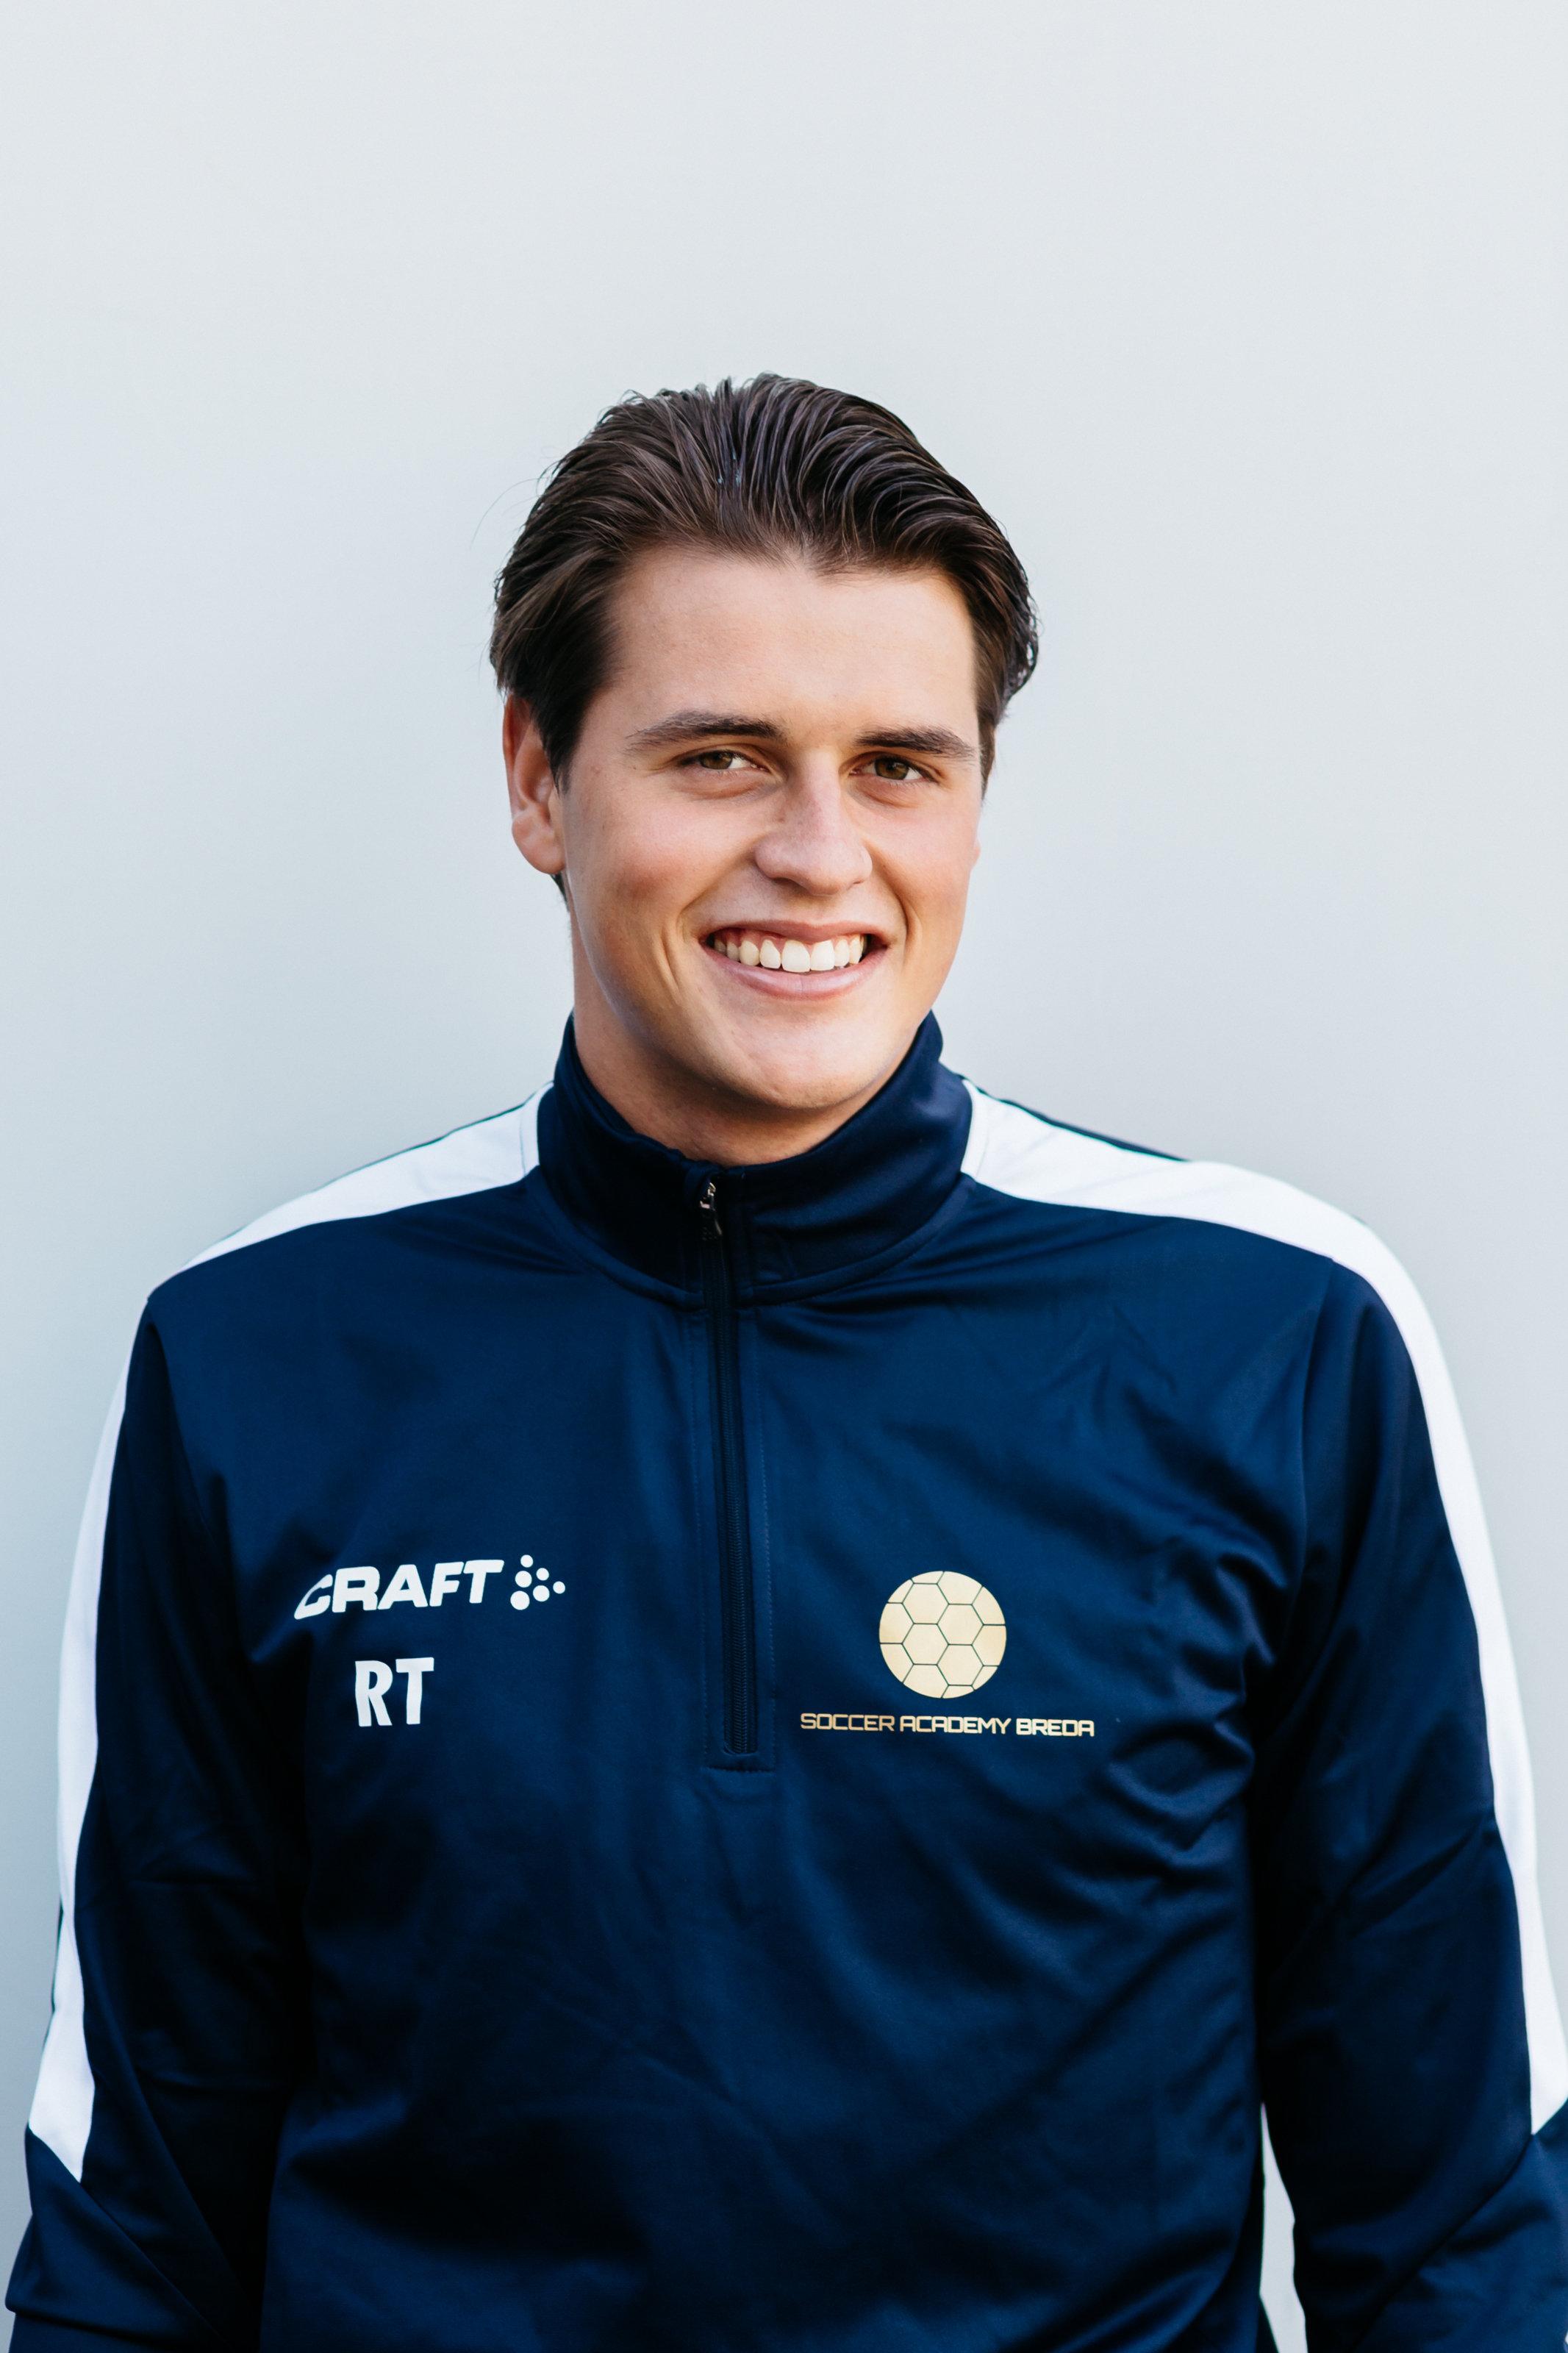 https://socceracademybreda.nl/wp-content/uploads/2020/10/Roman-Talboom.jpg